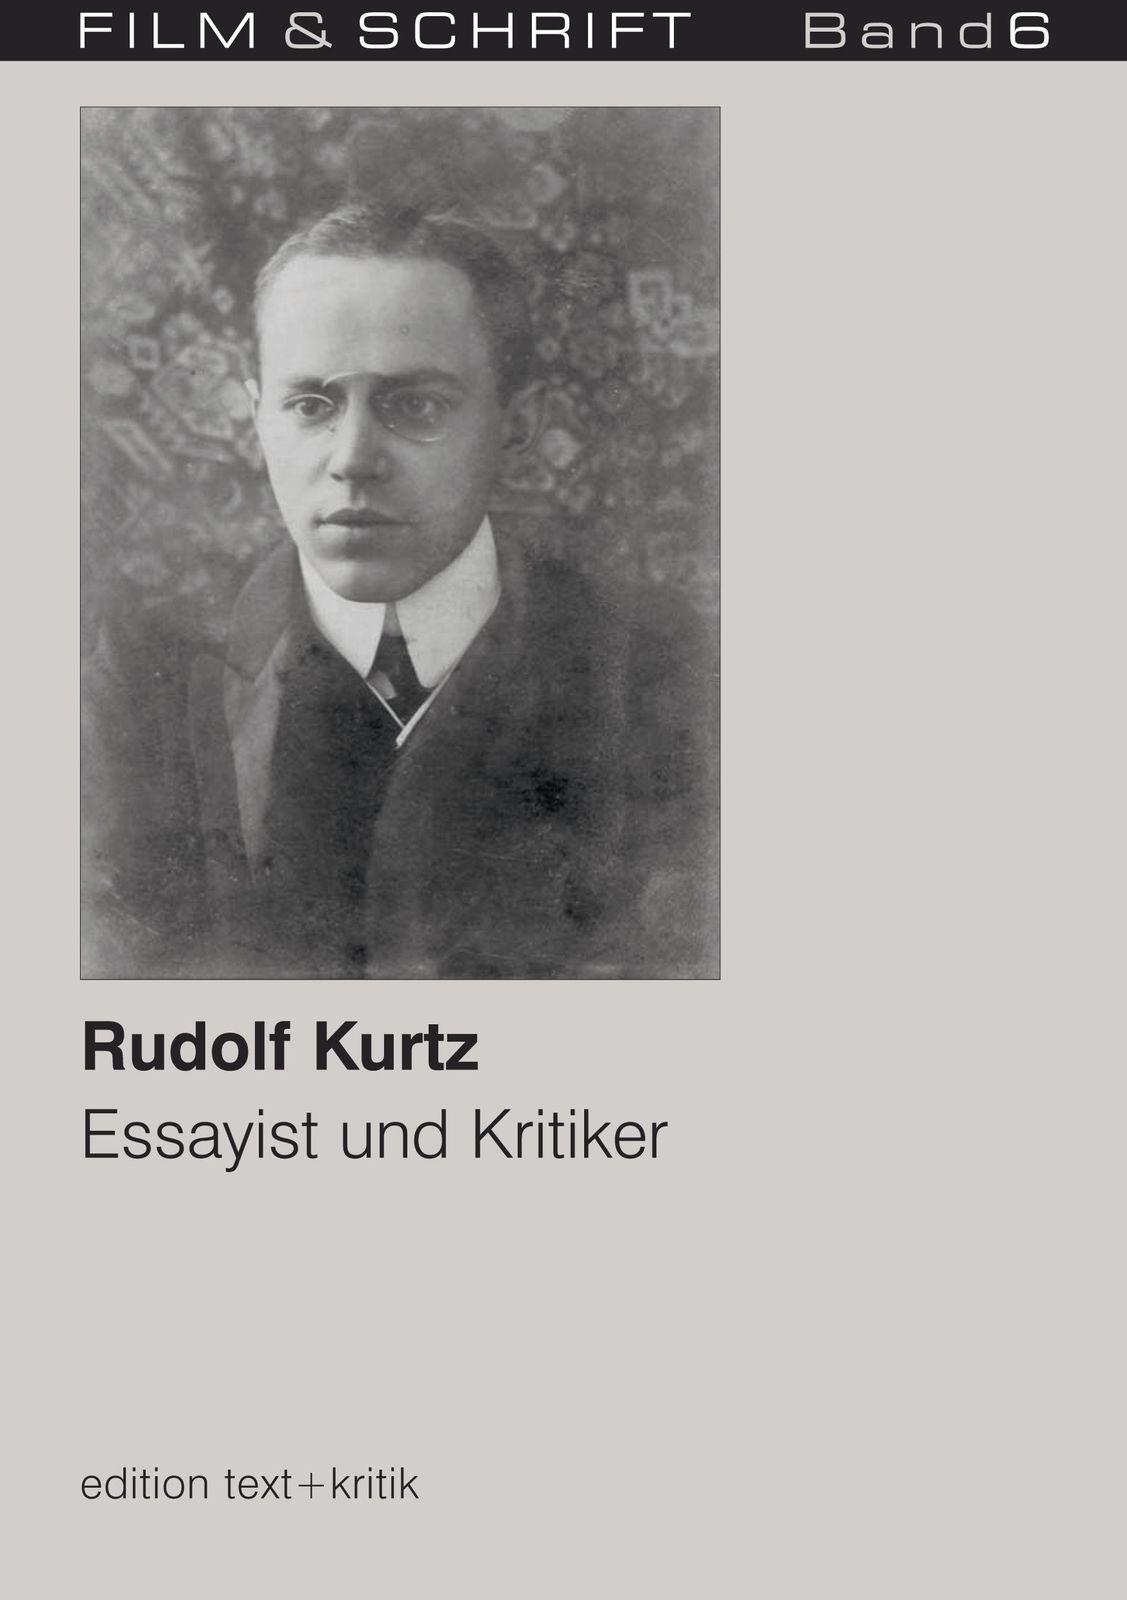 kurtz-film-2007-TextKritik-02